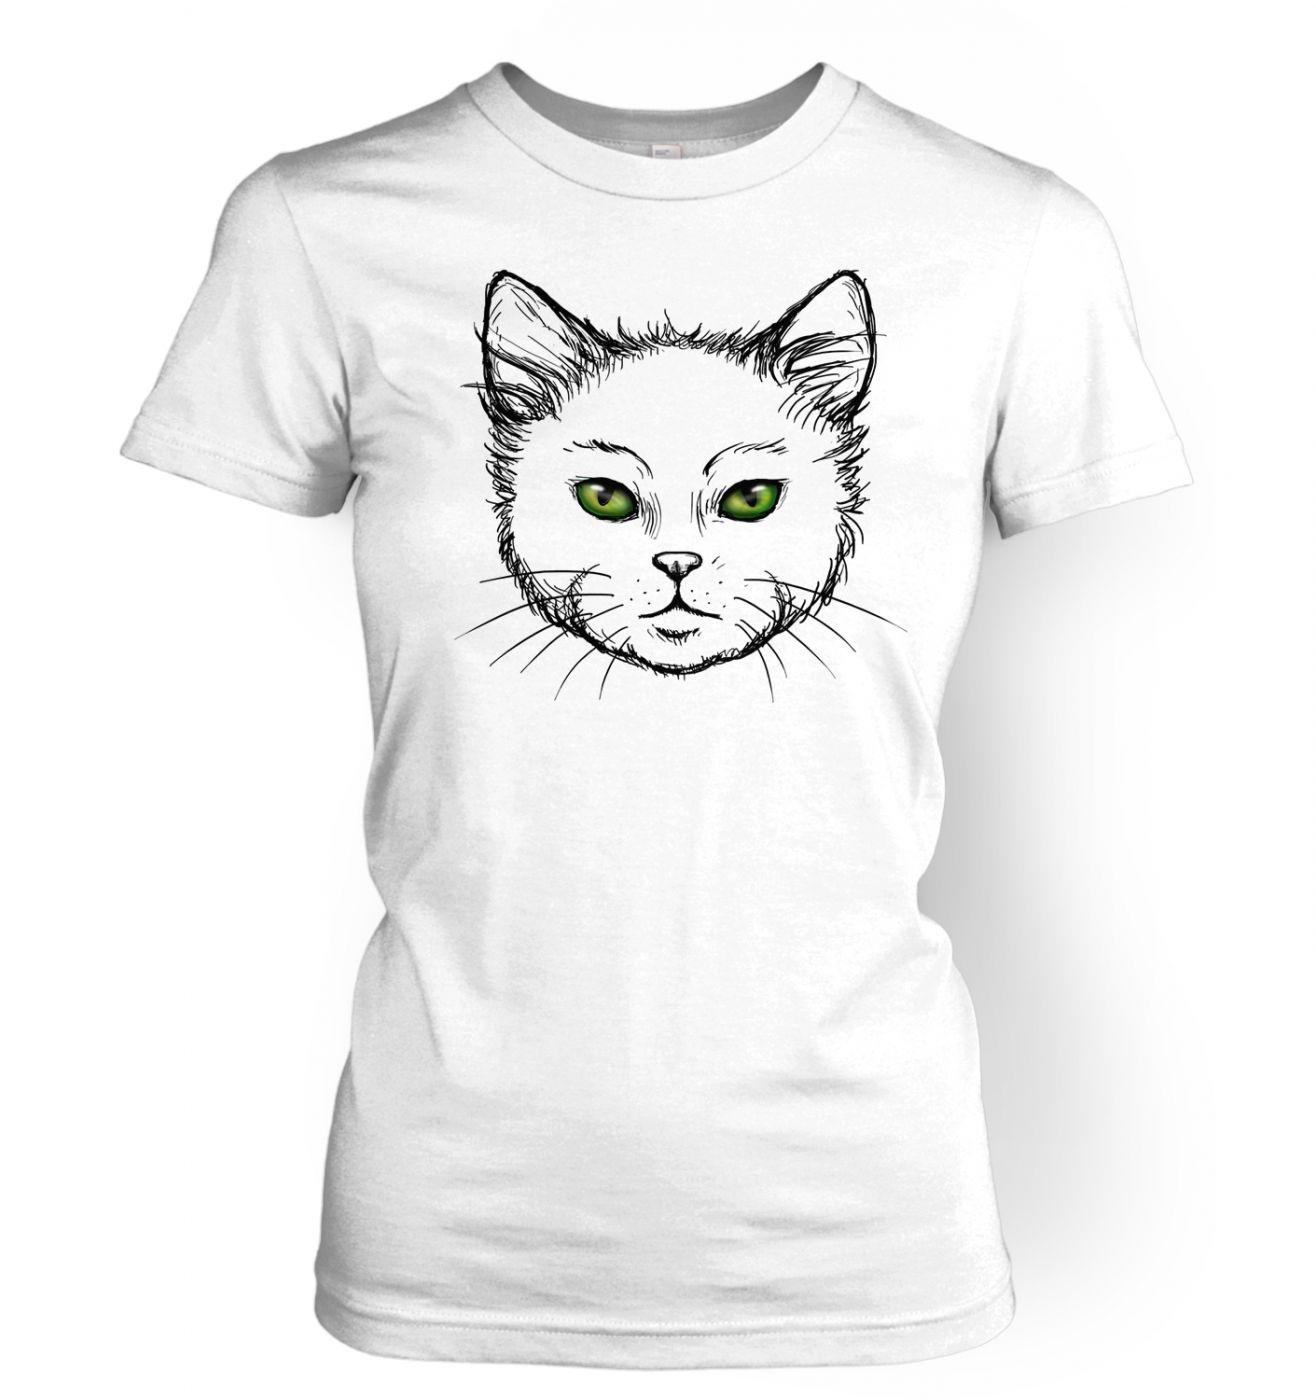 Eyes Of The Cat women's t-shirt (white) - cute cat tshirt